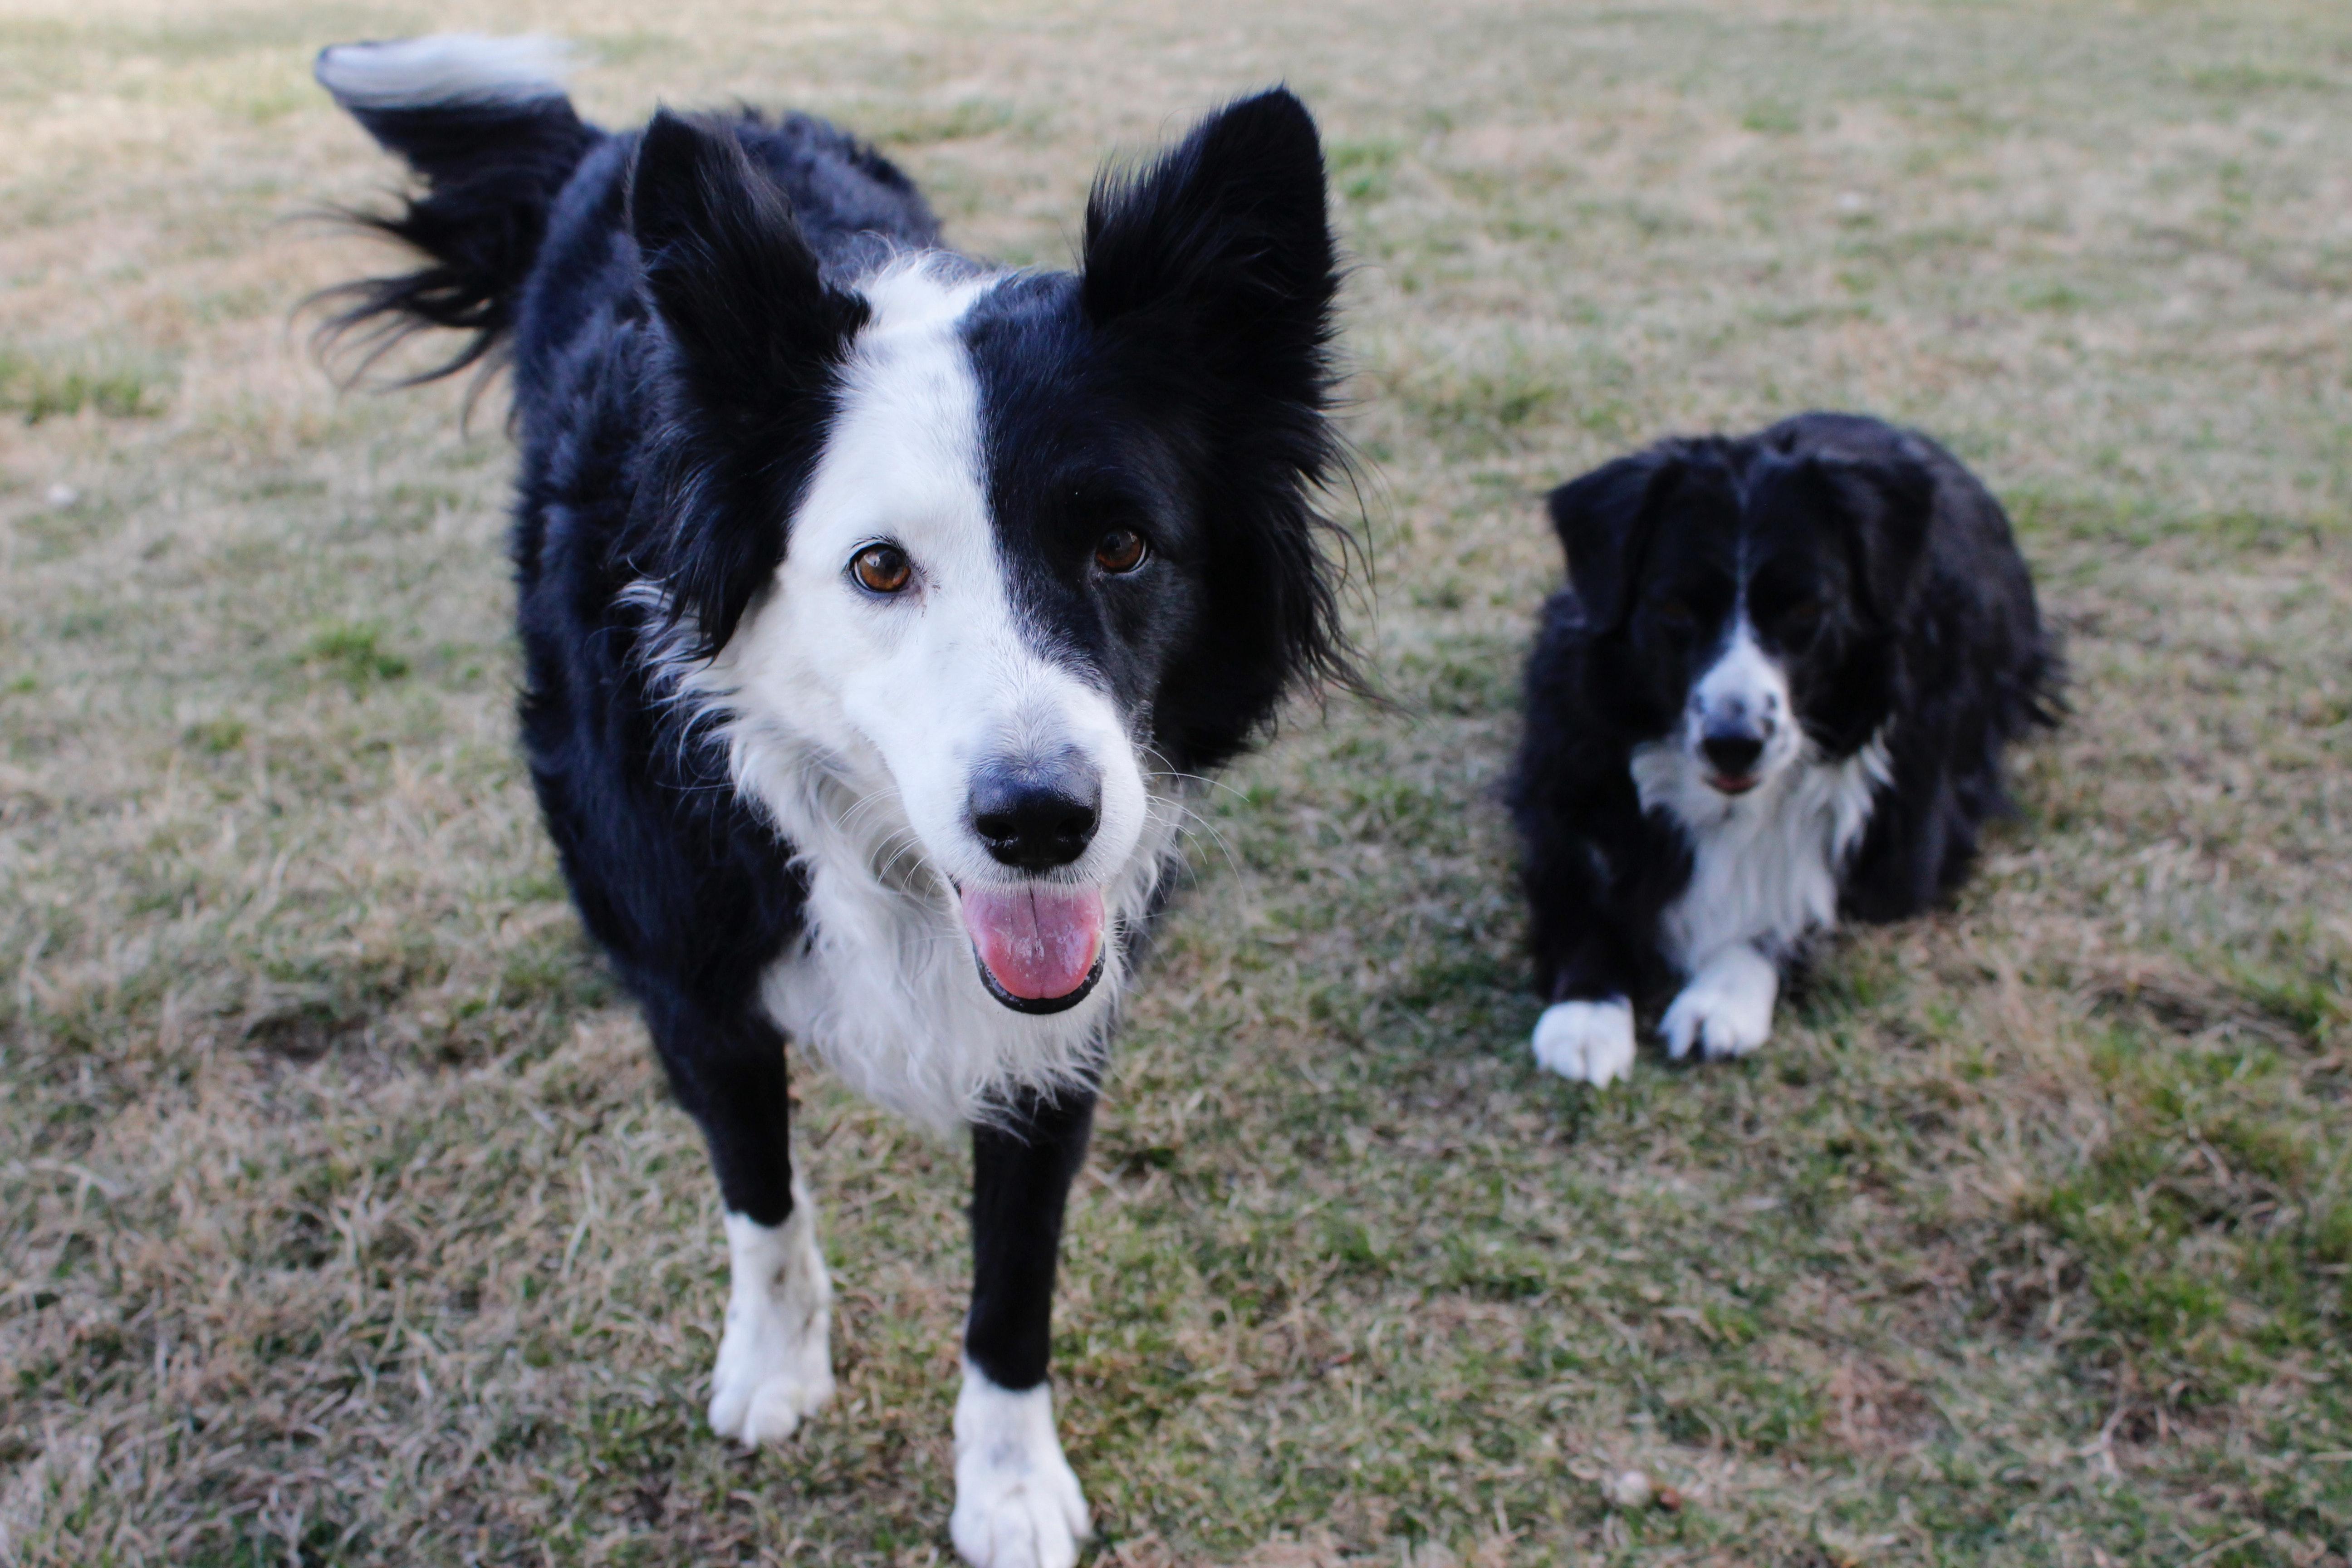 Herd U Needed A Home Canine Rescue @ Eastside Bend Pet